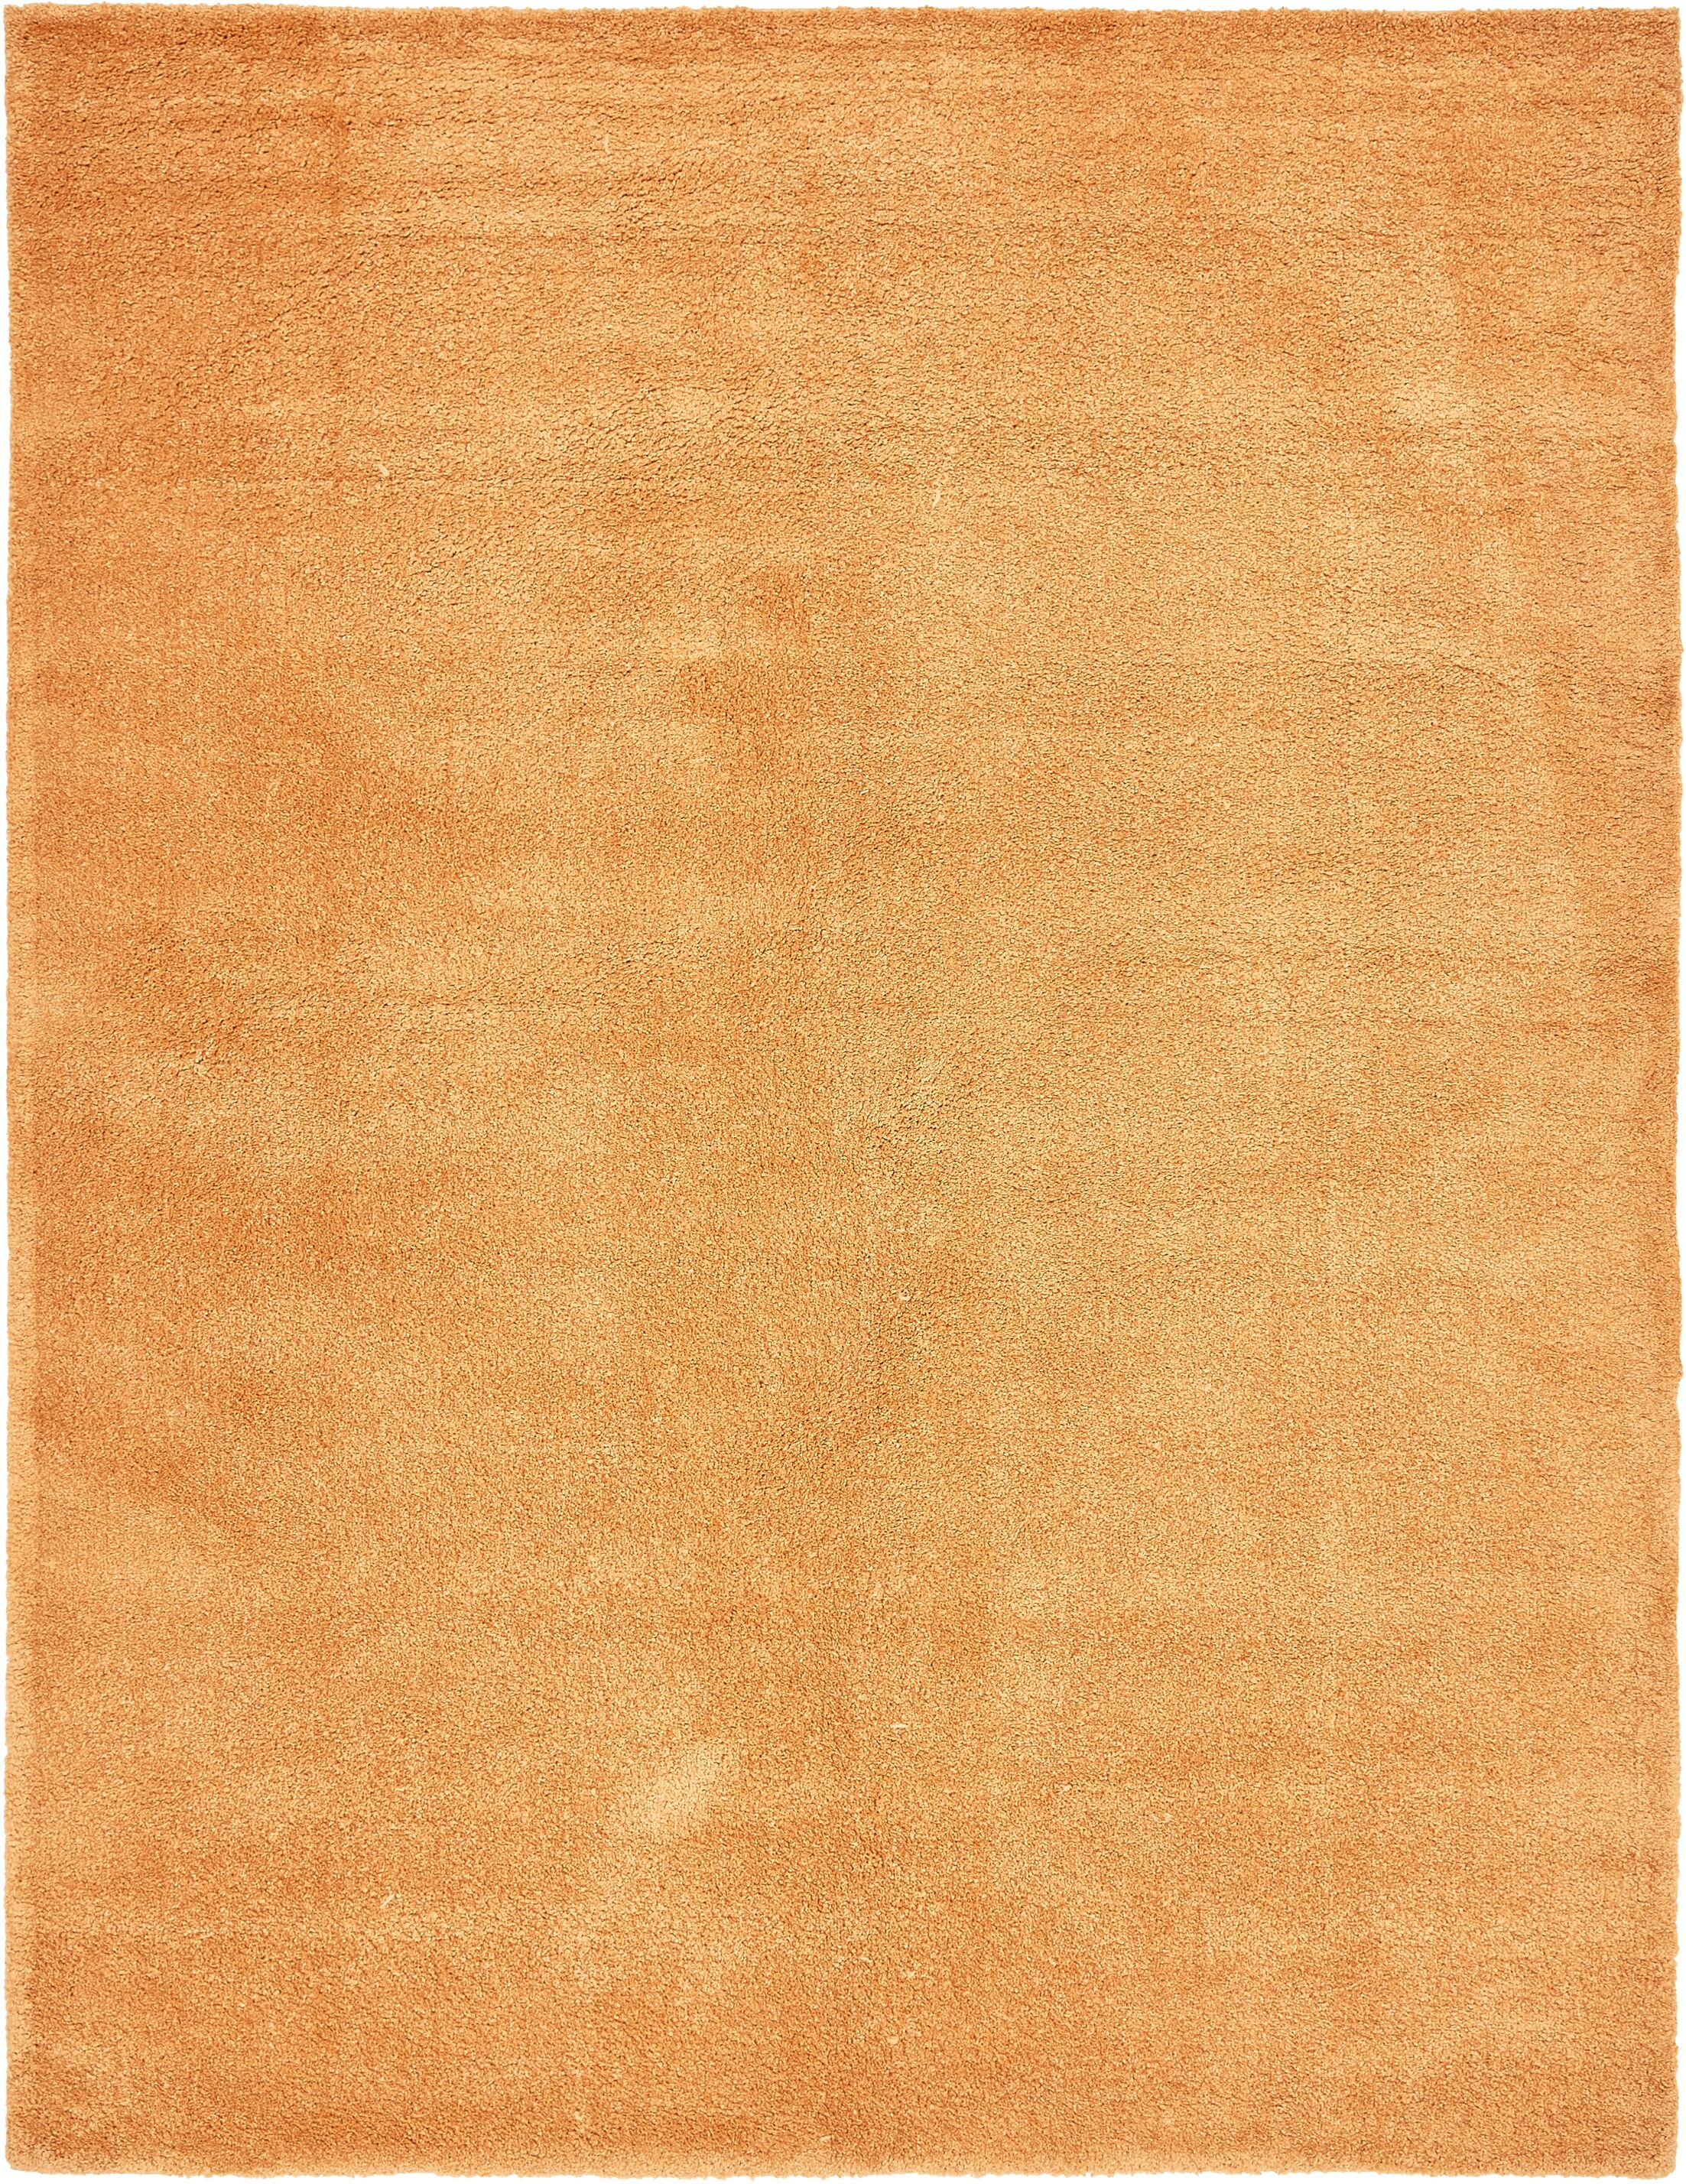 Truett Orange Area Rug Rug Size: Rectangle 10' x 13'